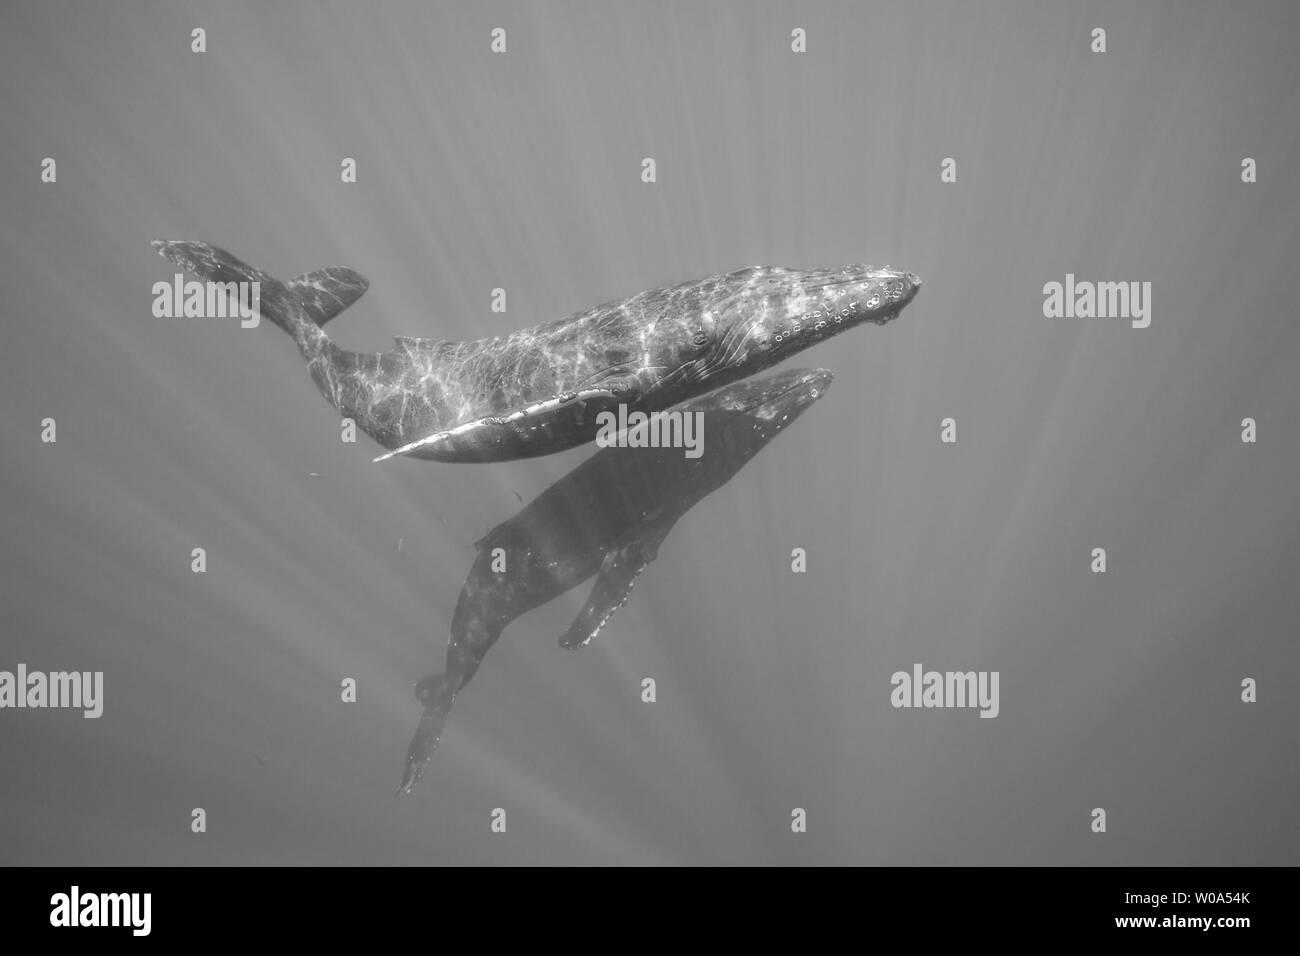 Les baleines à bosse, Megaptera novaeangliae, sous-marin, Hawaii. Banque D'Images